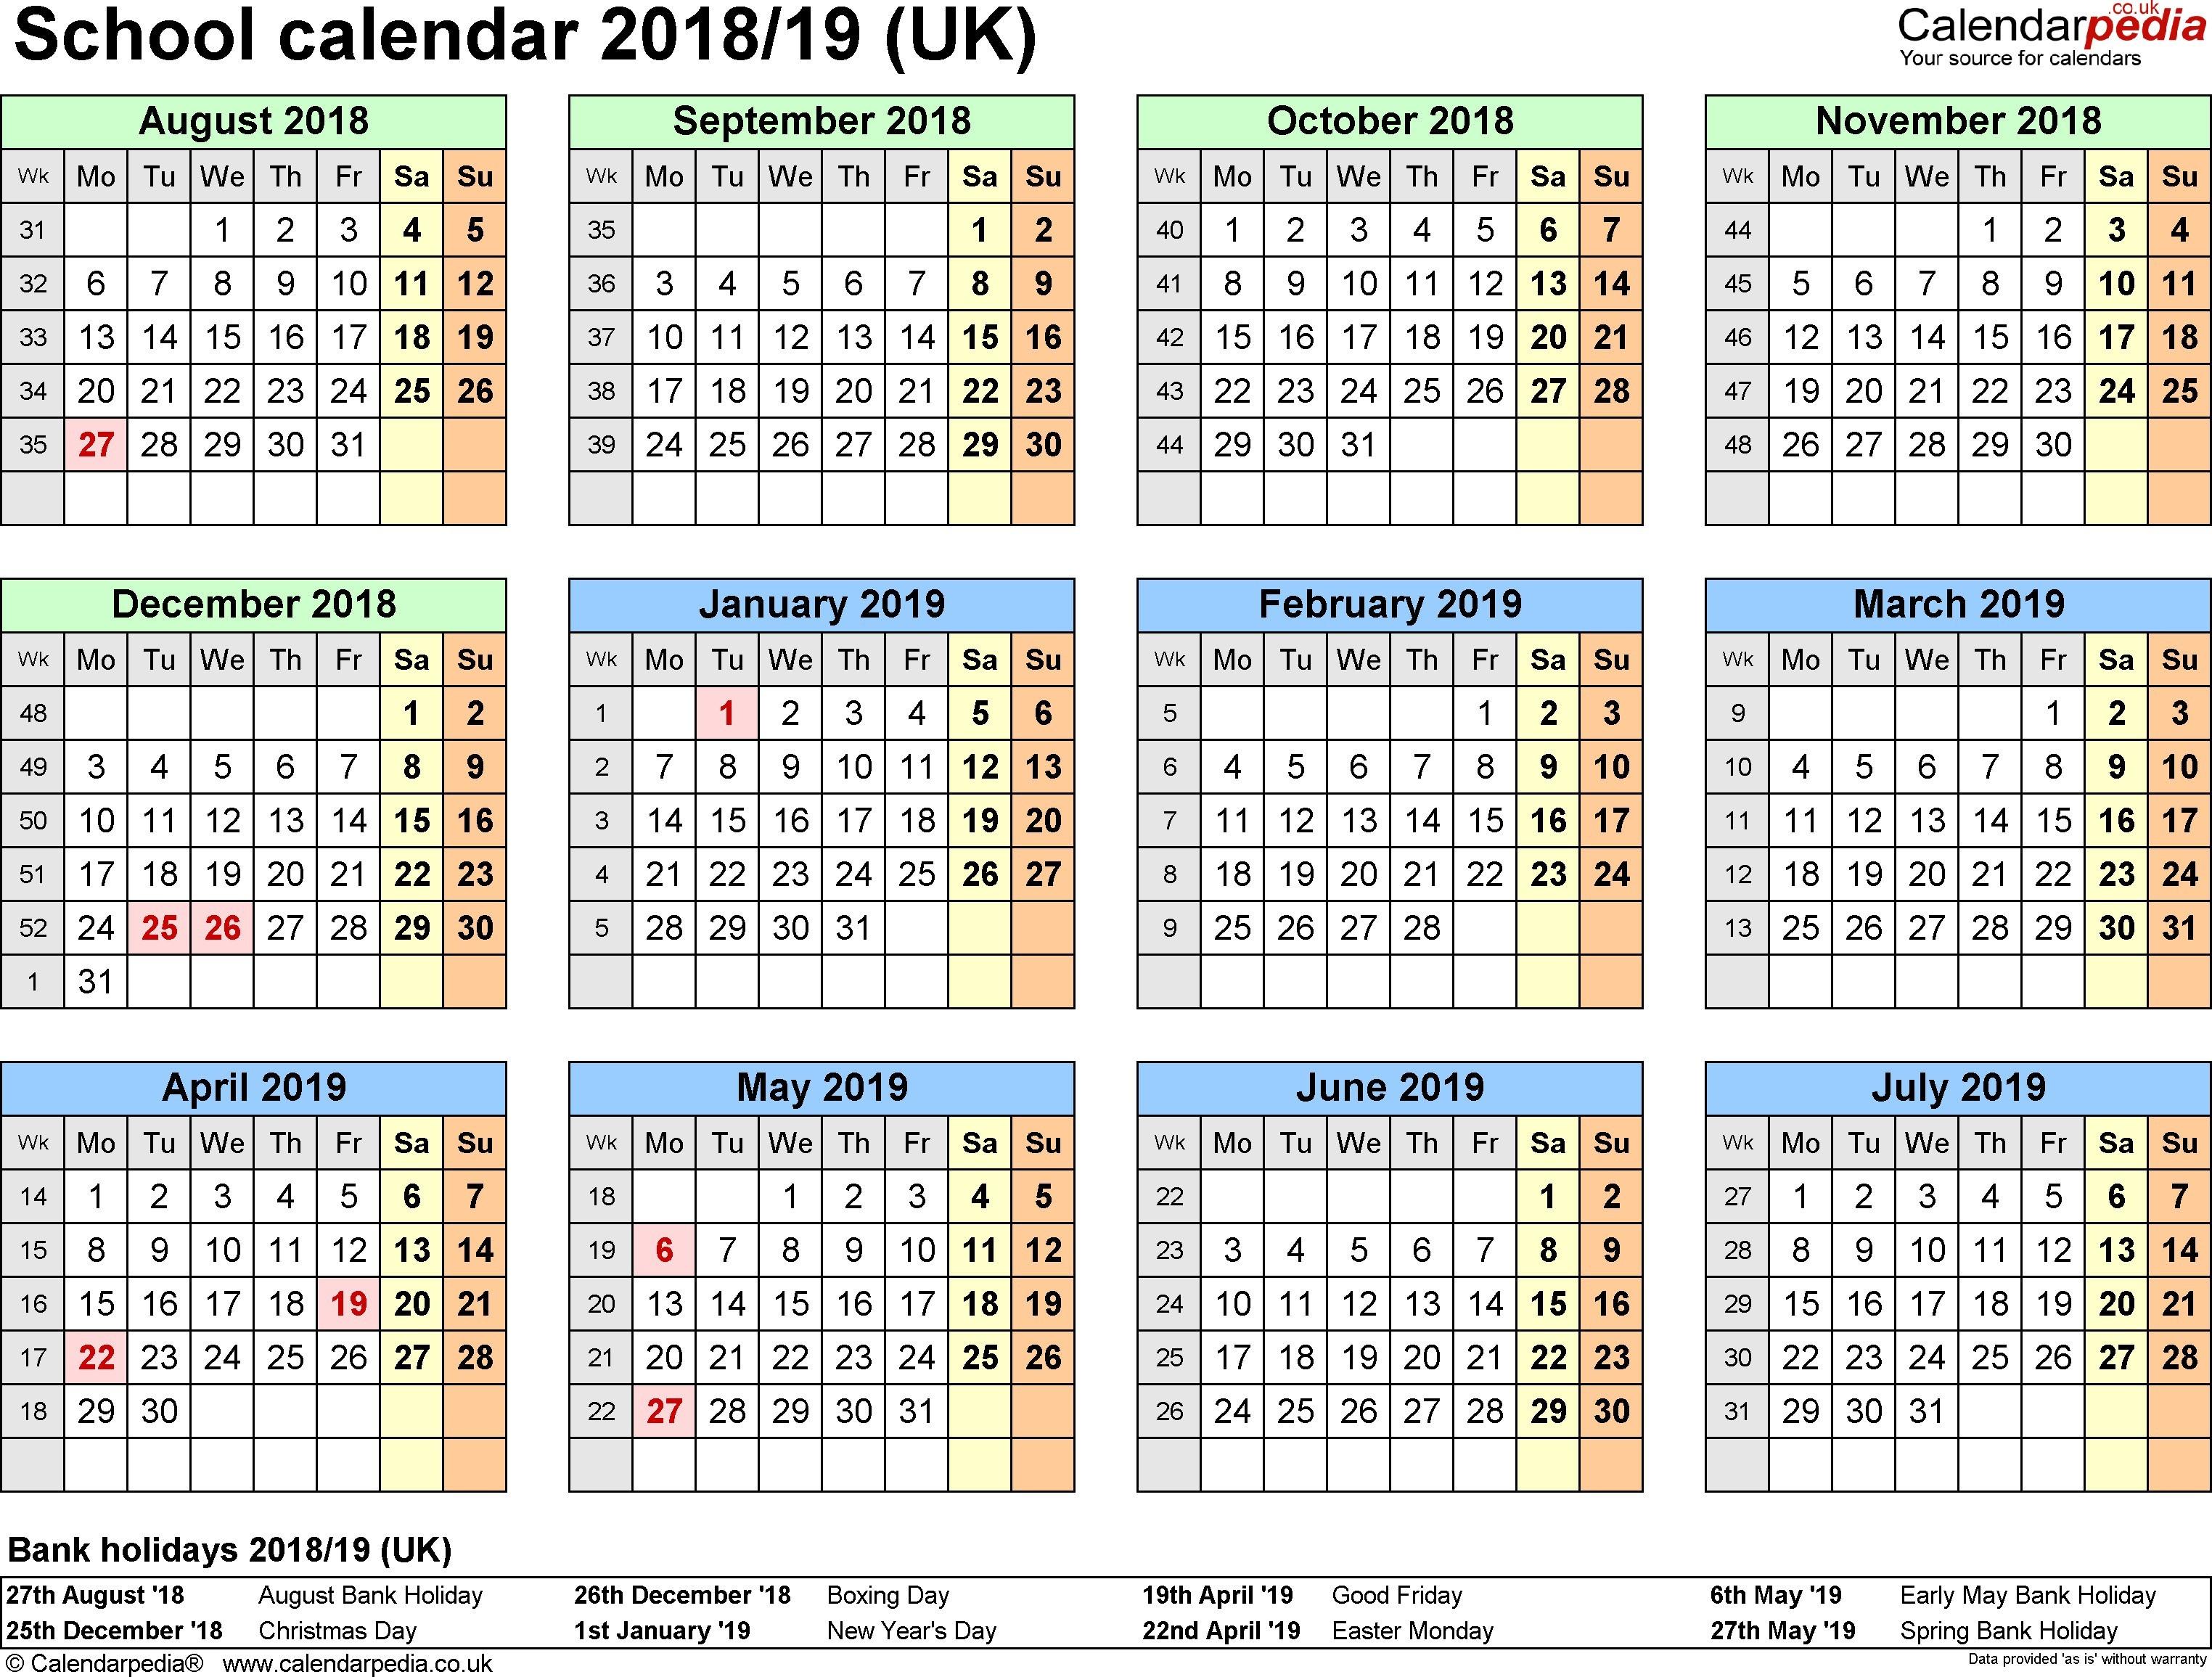 At A Glance 2018 Calendar School Calendars 2018 2019 as Free Printable Word Templates